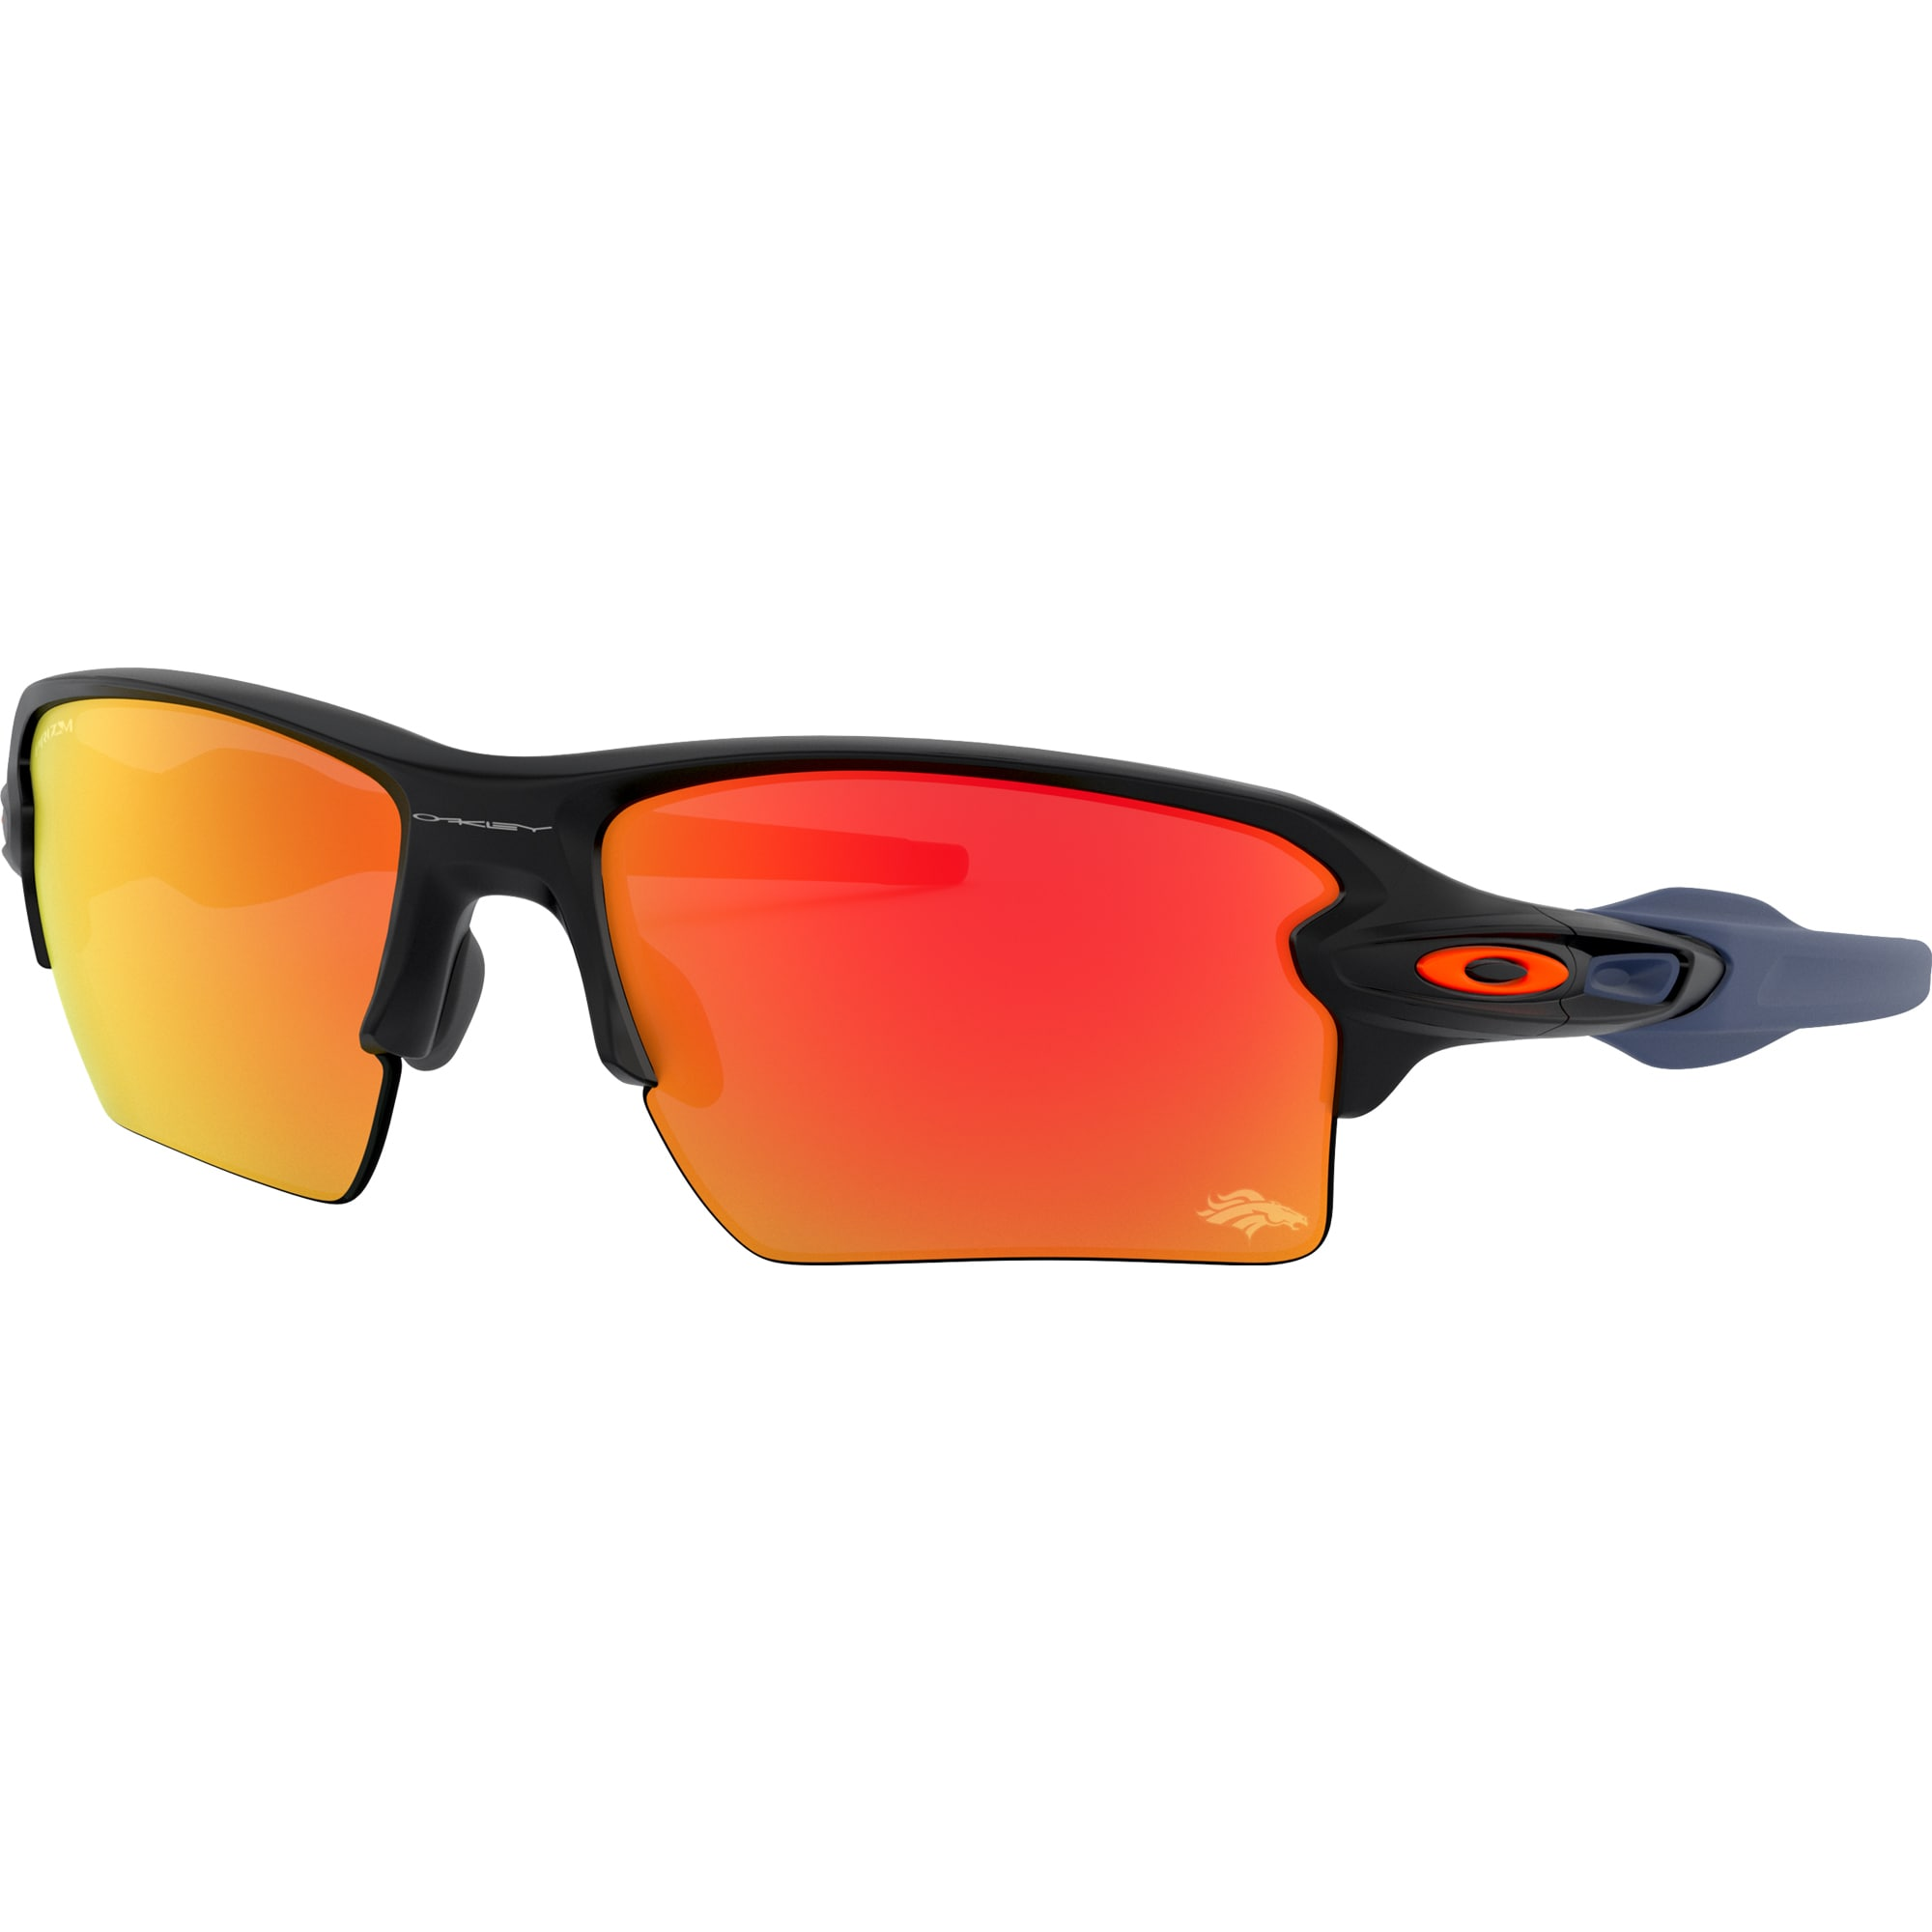 Denver Broncos Oakley Flak 2.0 XL Sunglasses